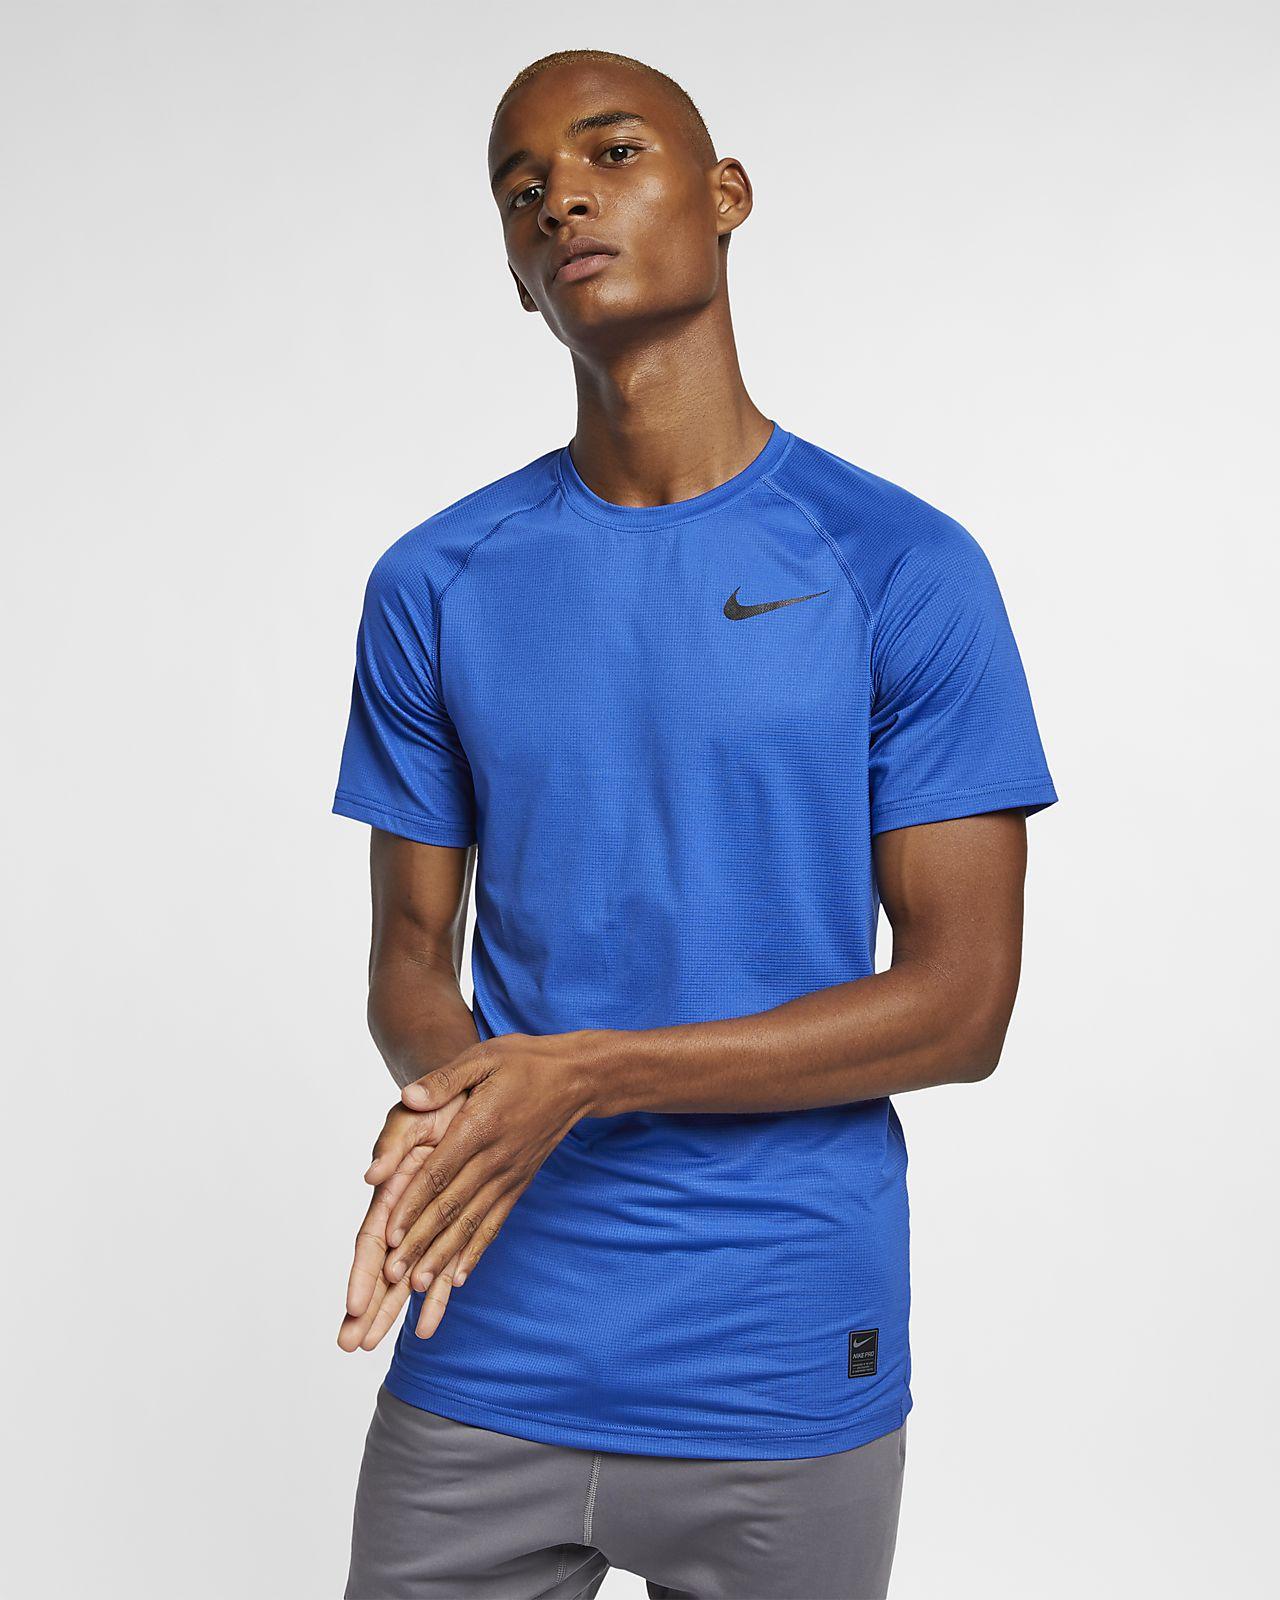 Nike Breathe Pro男子短袖训练上衣